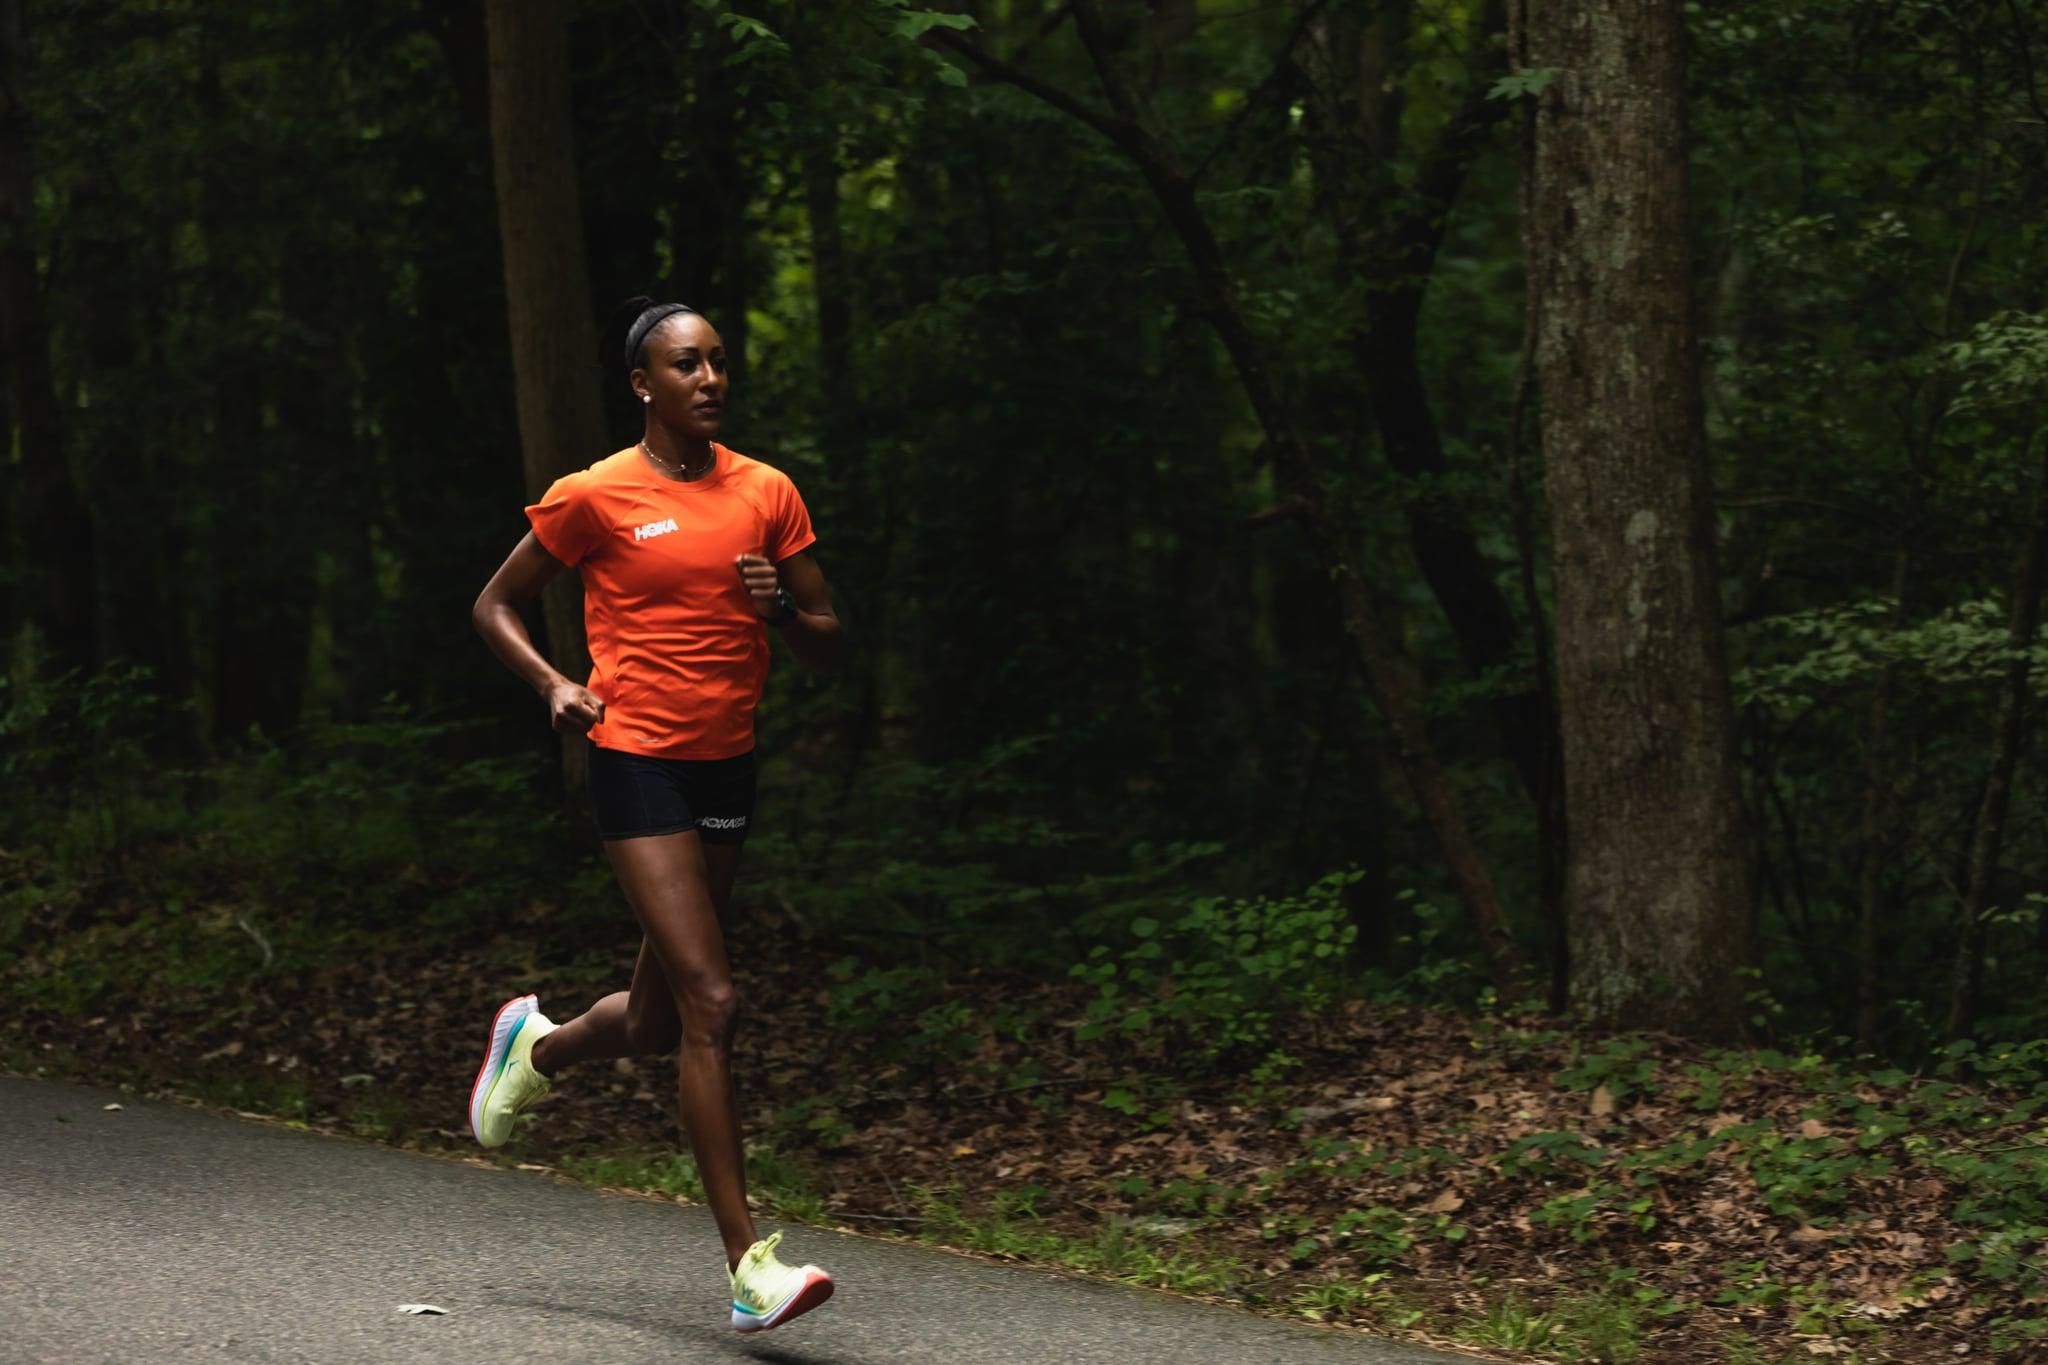 Sika Henry, first Black woman triathlete